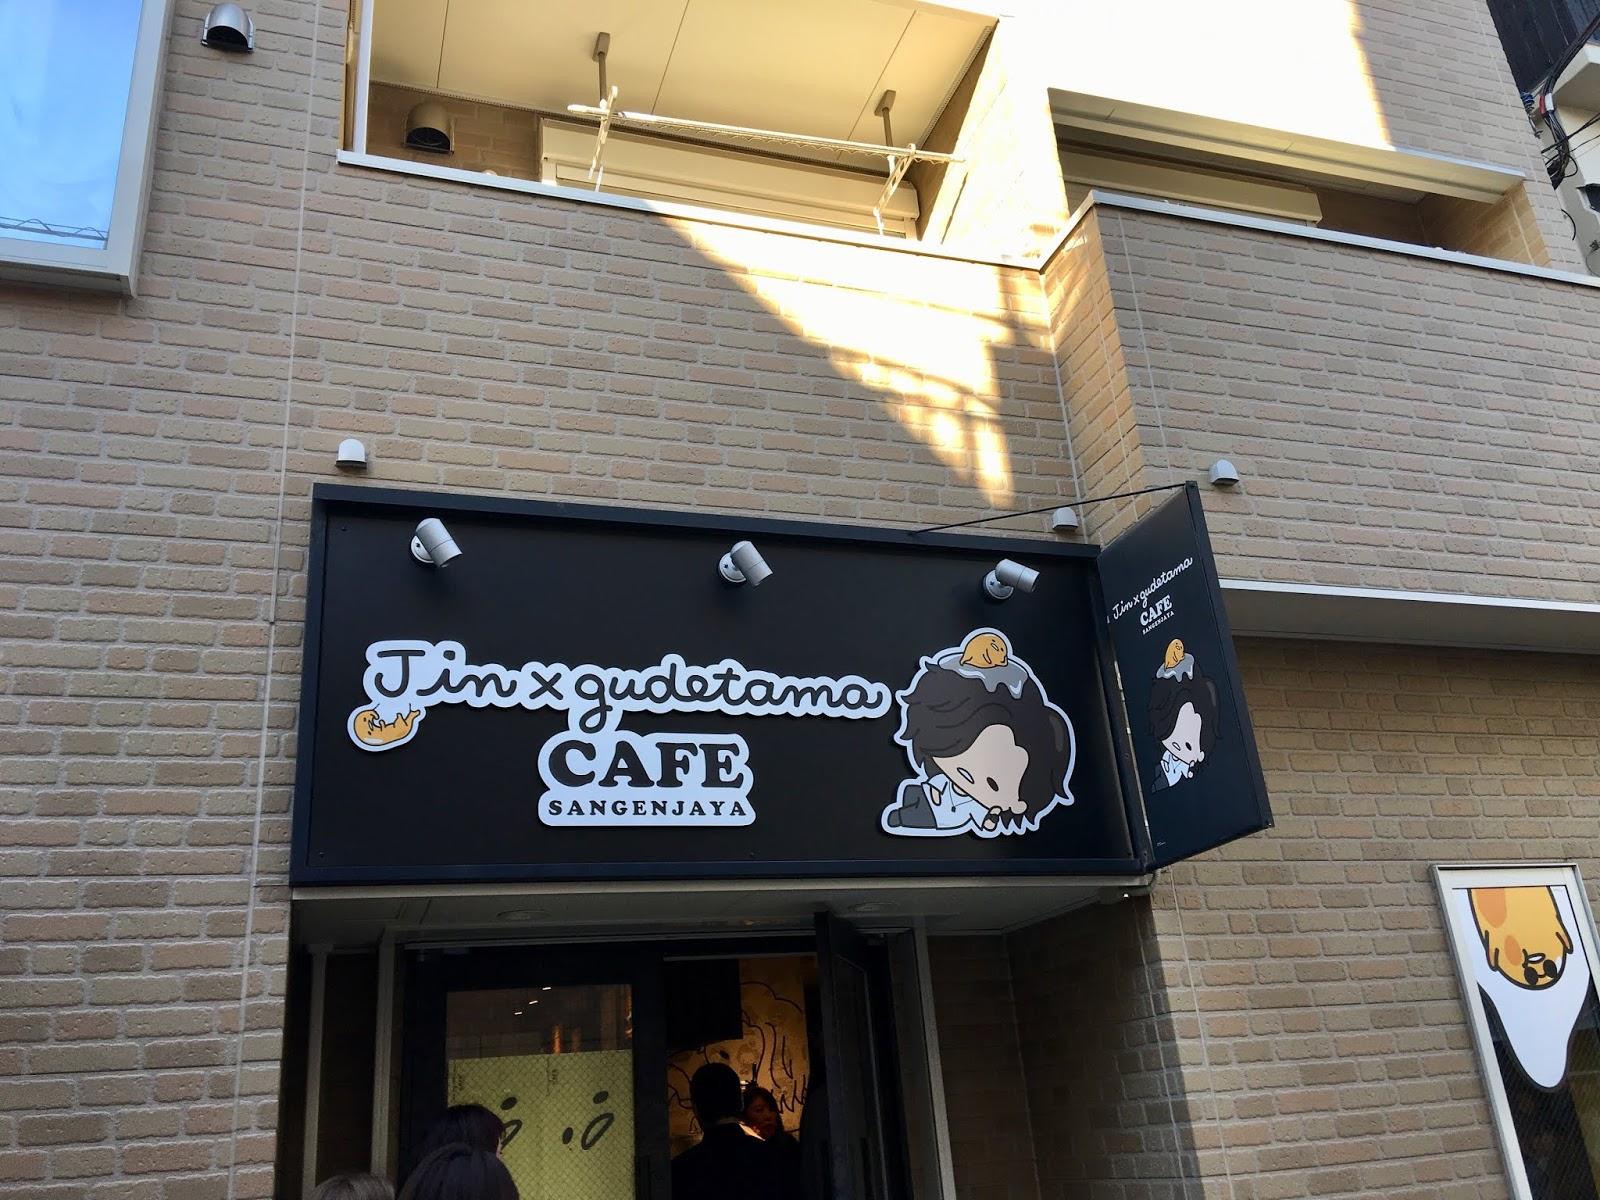 Jin x gudetama Cafe